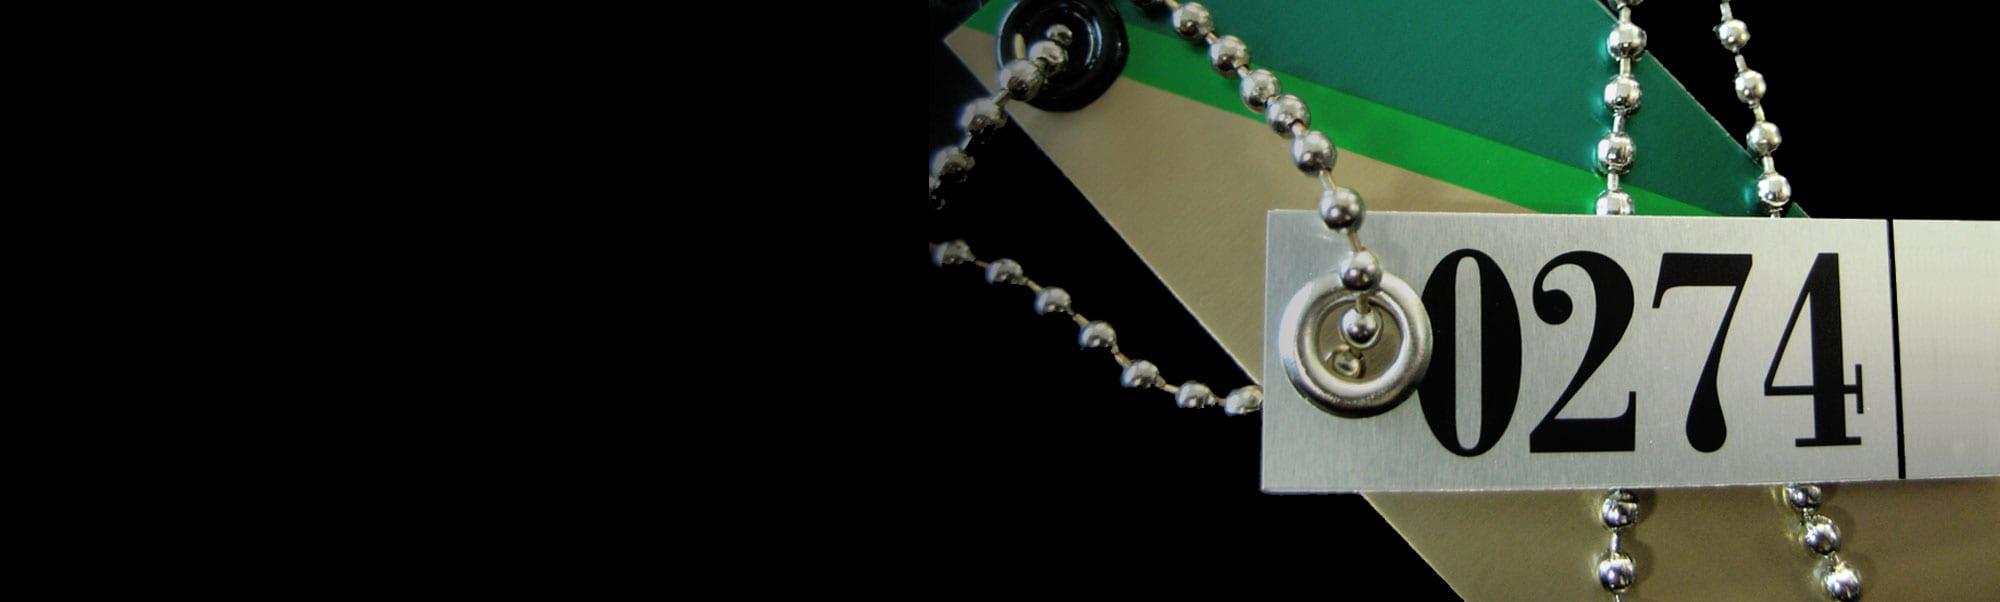 Accessories-2000x602px